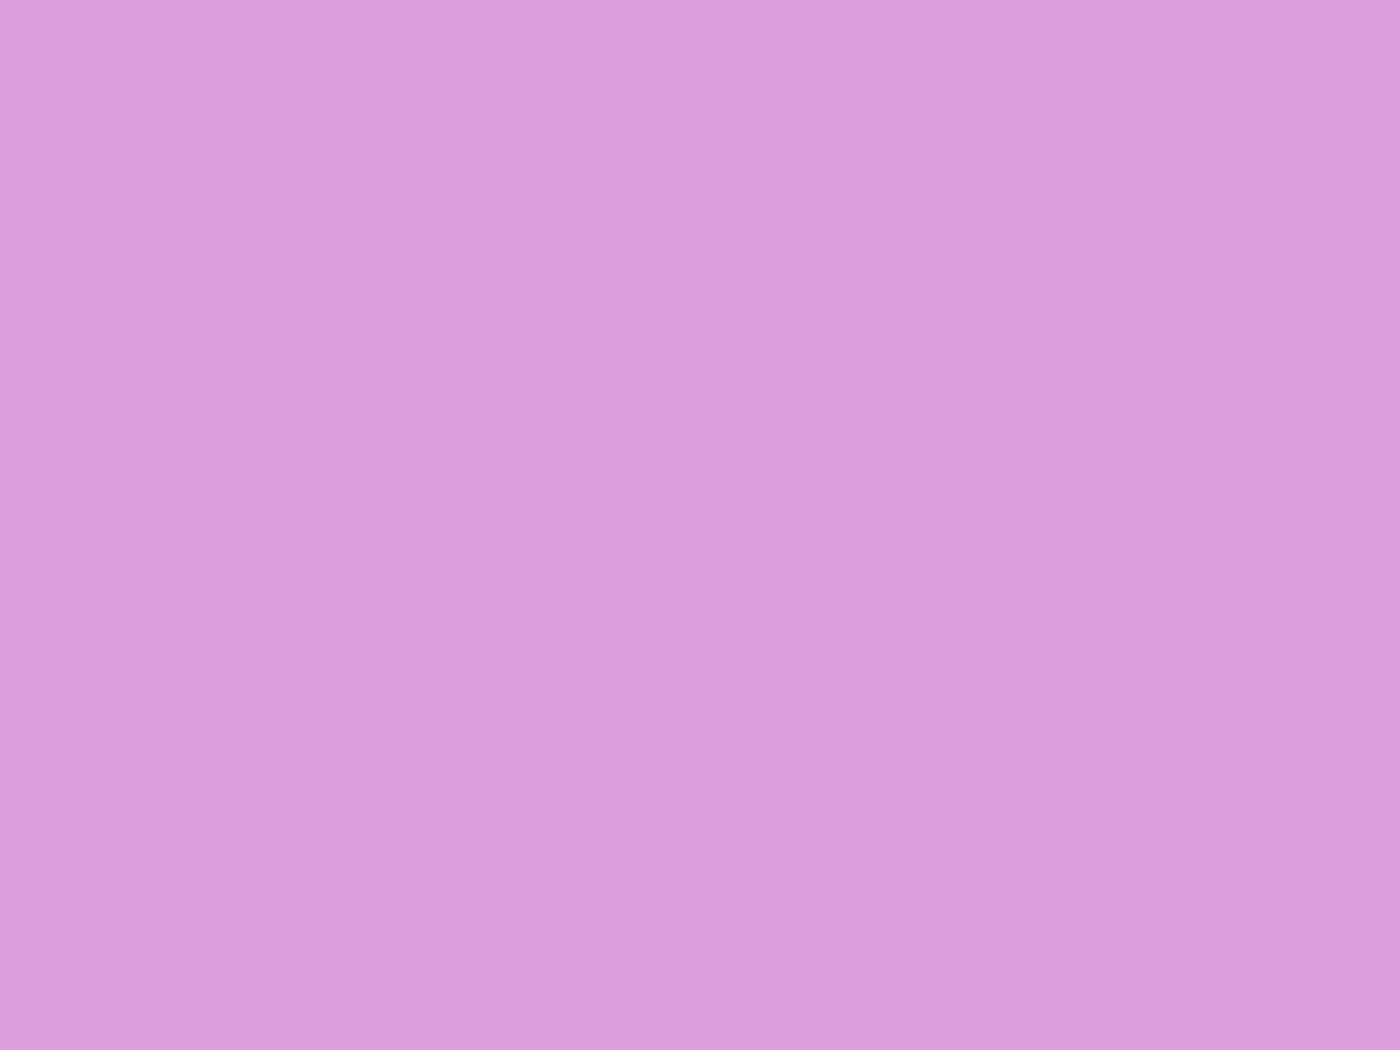 1400x1050 Plum Web Solid Color Background